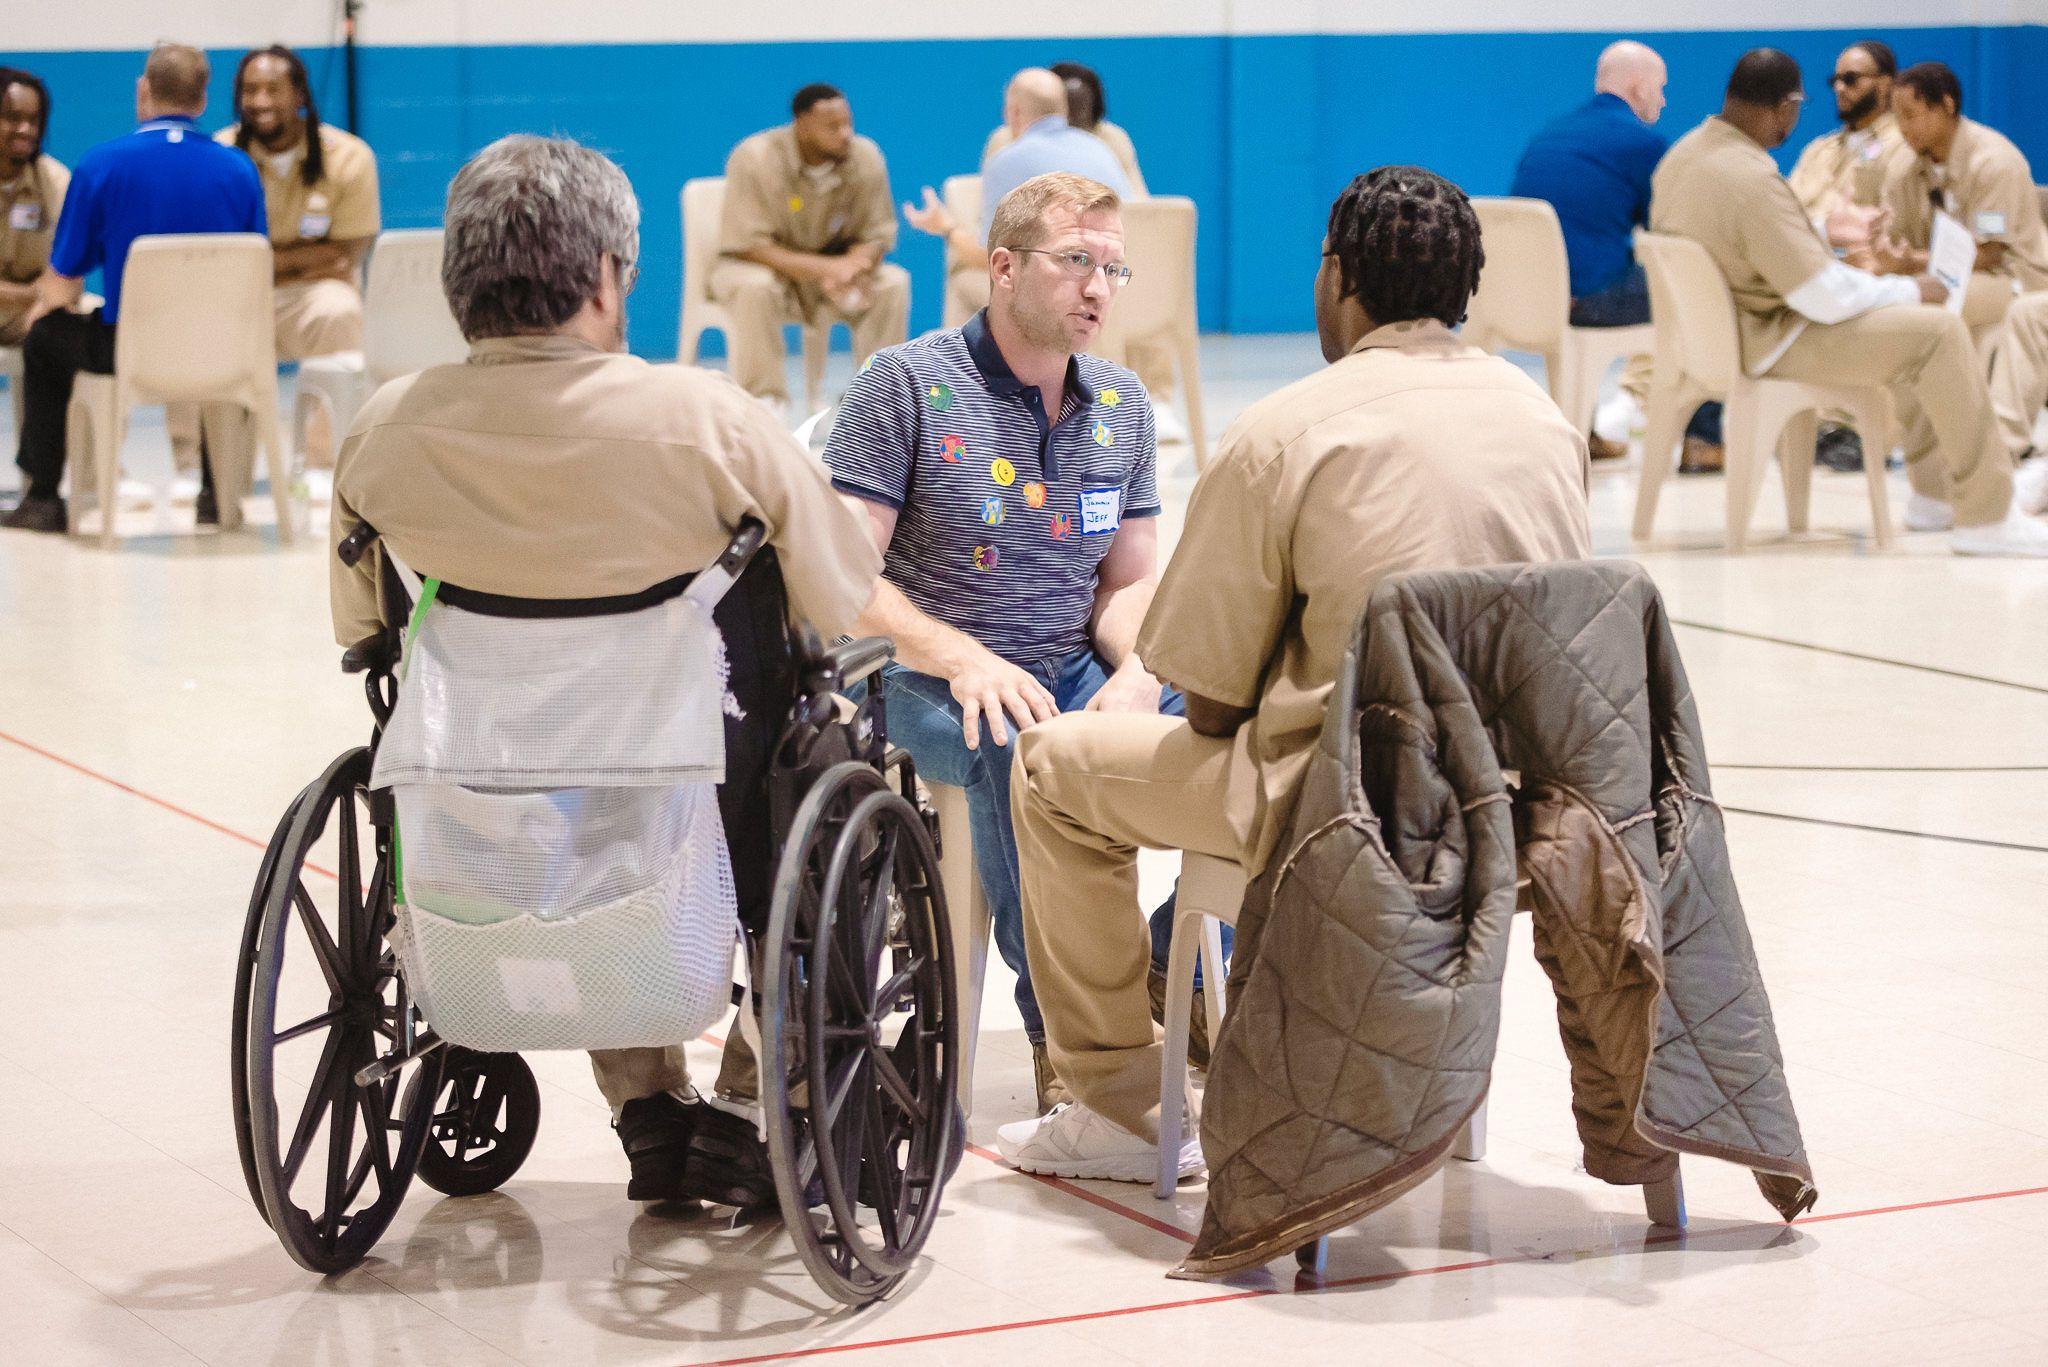 CANCELLED - Nebraska State Penitentiary Coaching Day